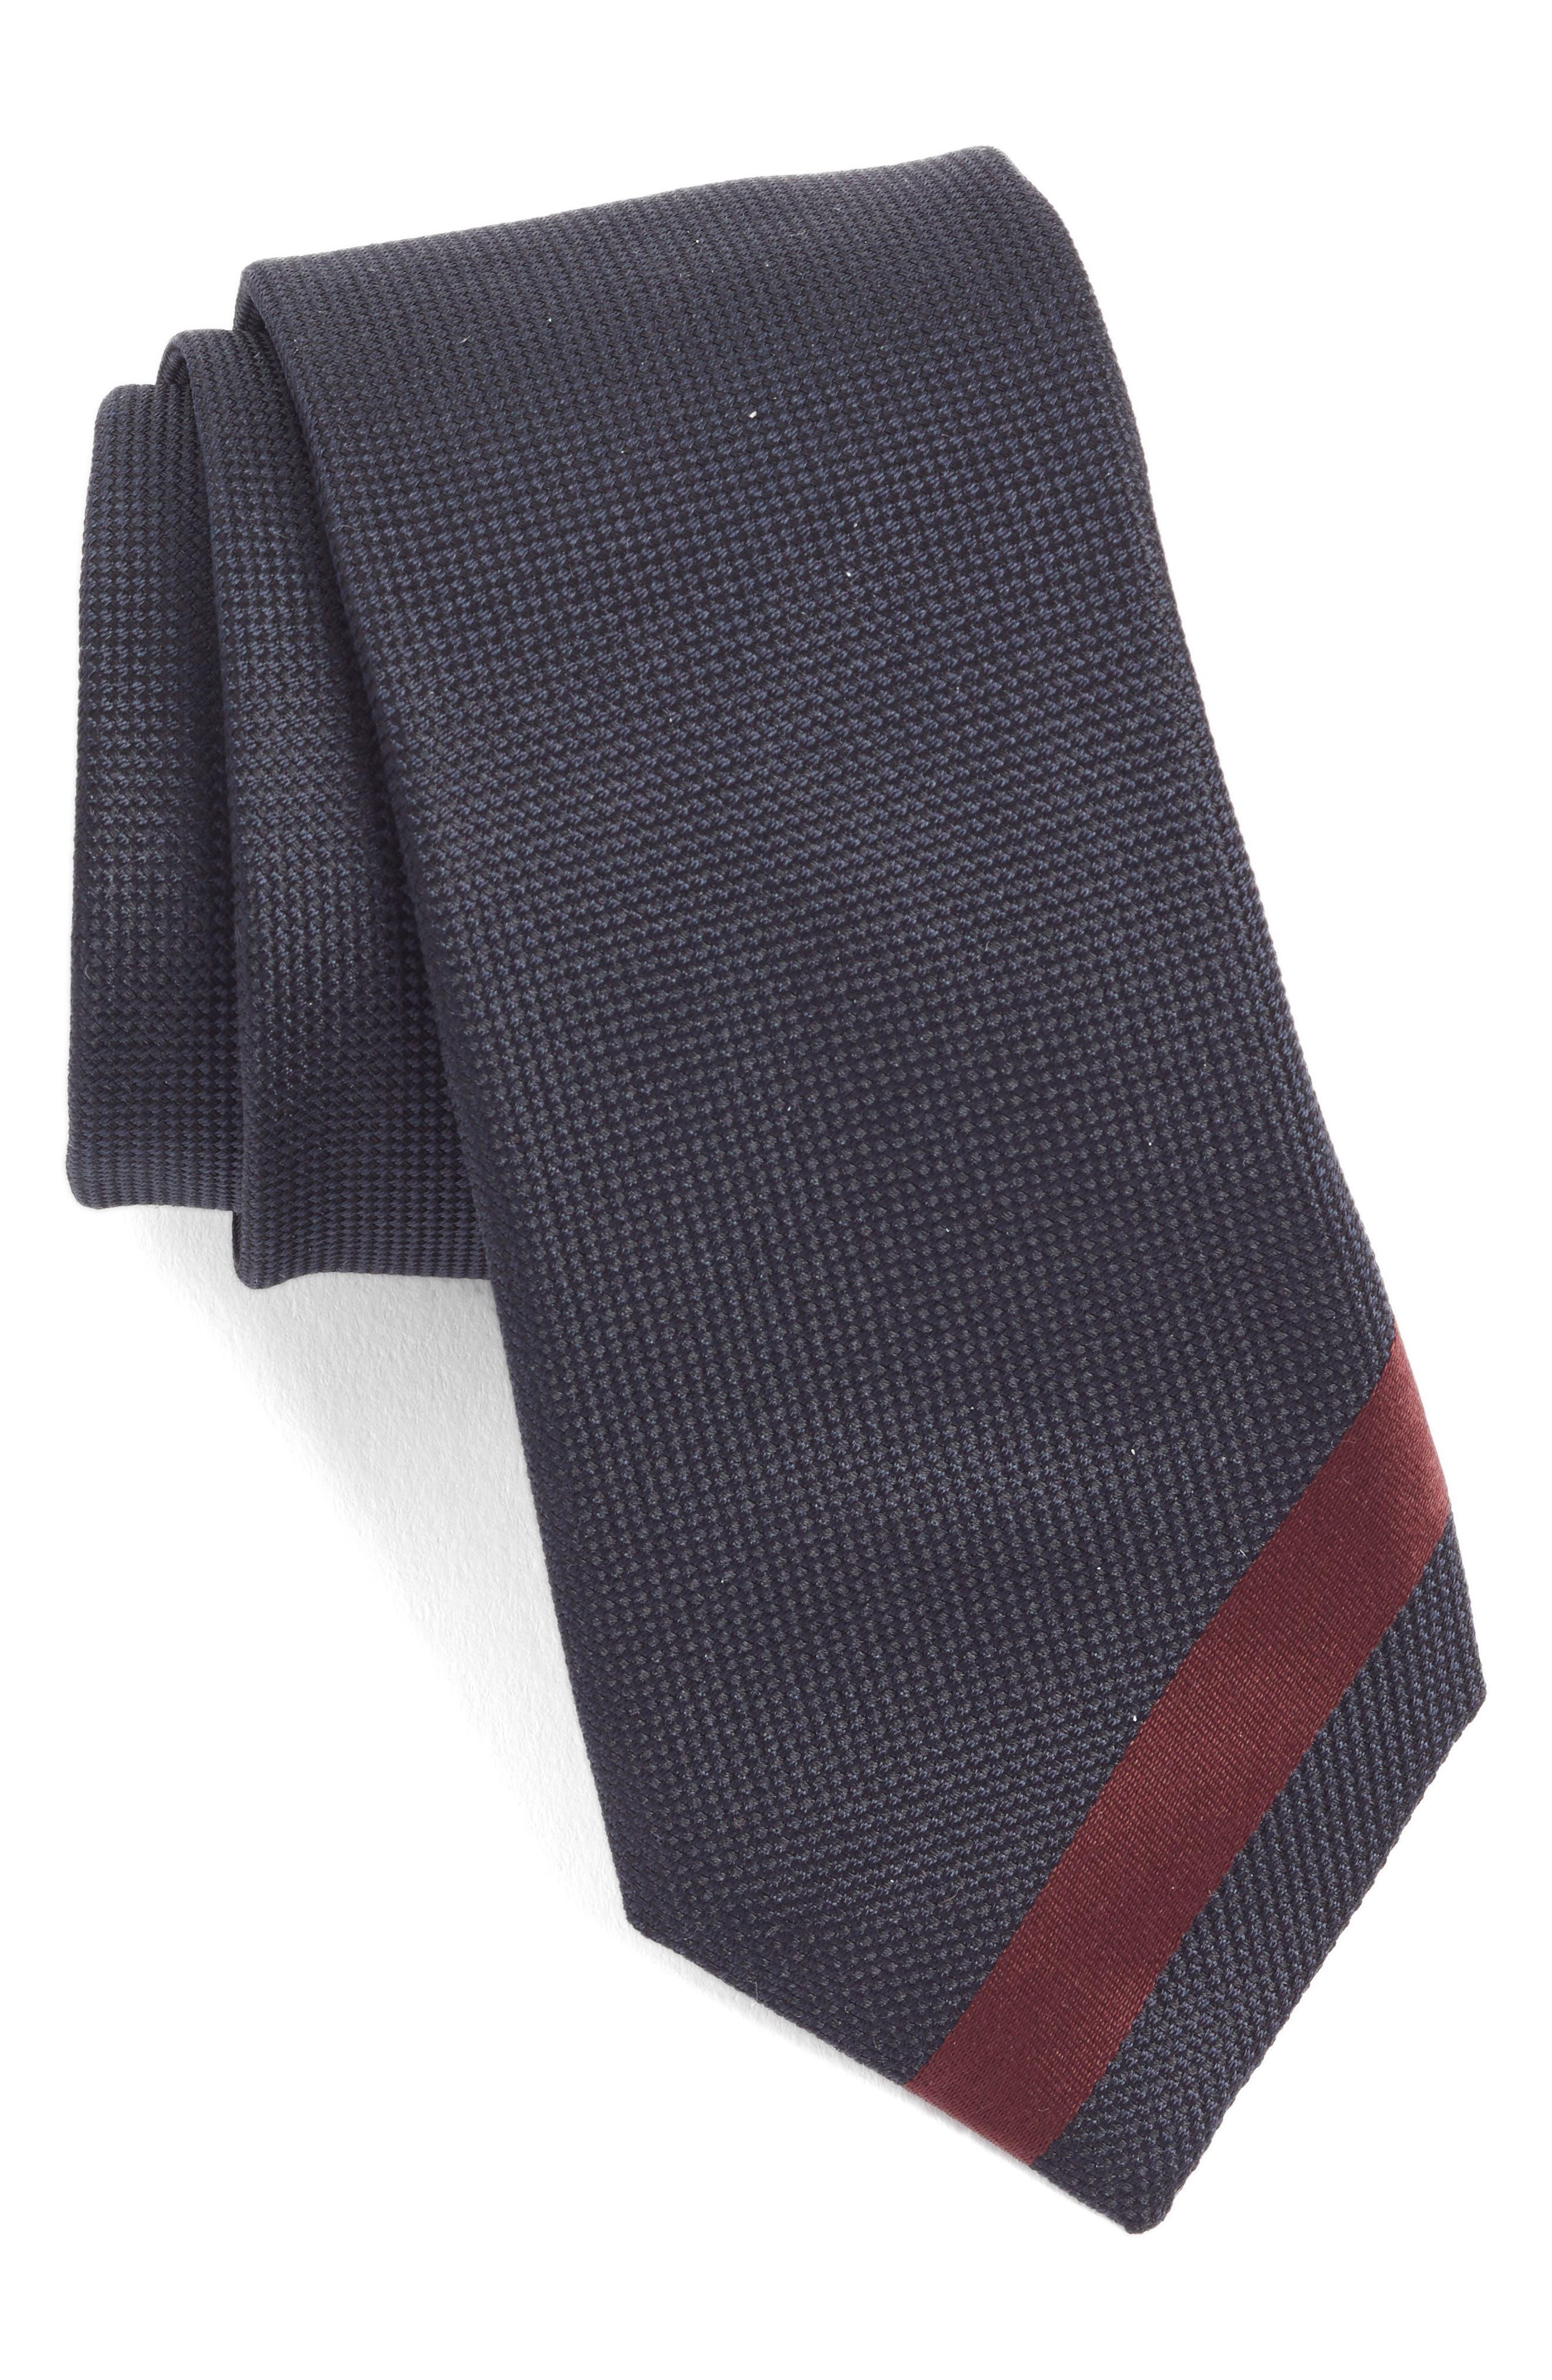 x Nordstrom Silk Tie,                             Main thumbnail 1, color,                             BLUE